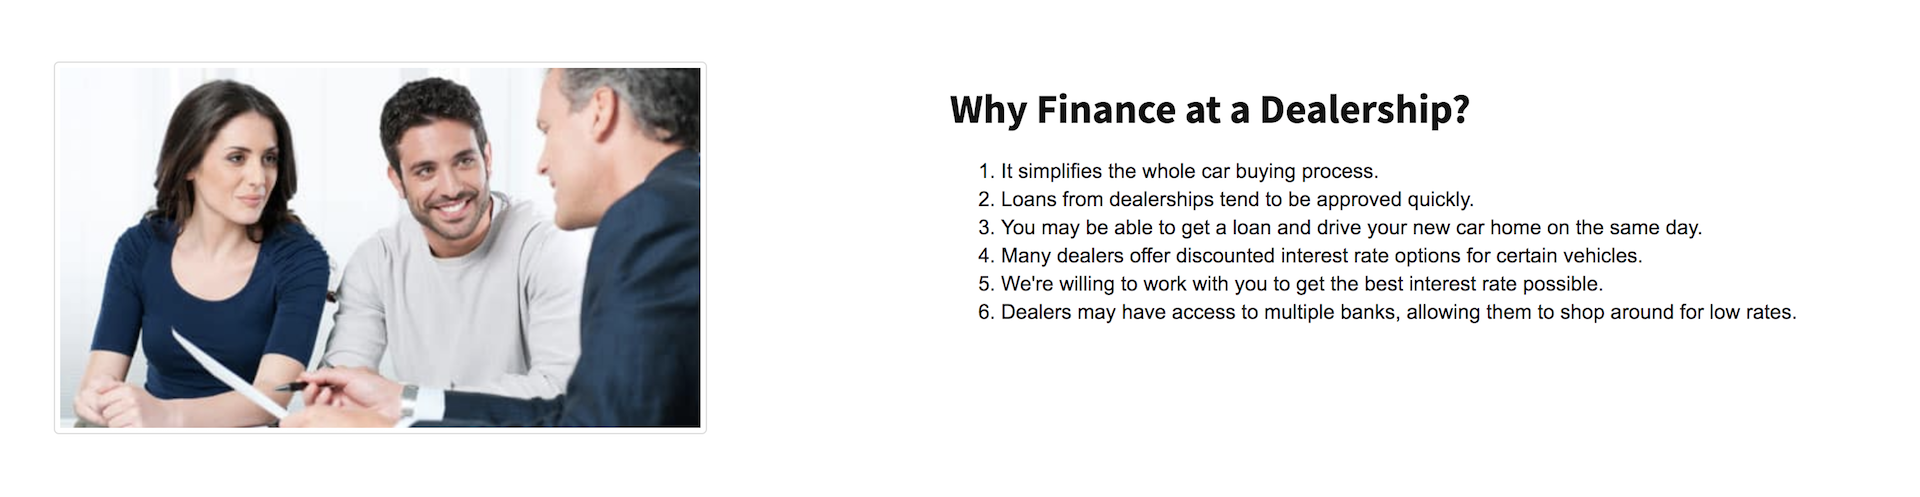 Why Finance